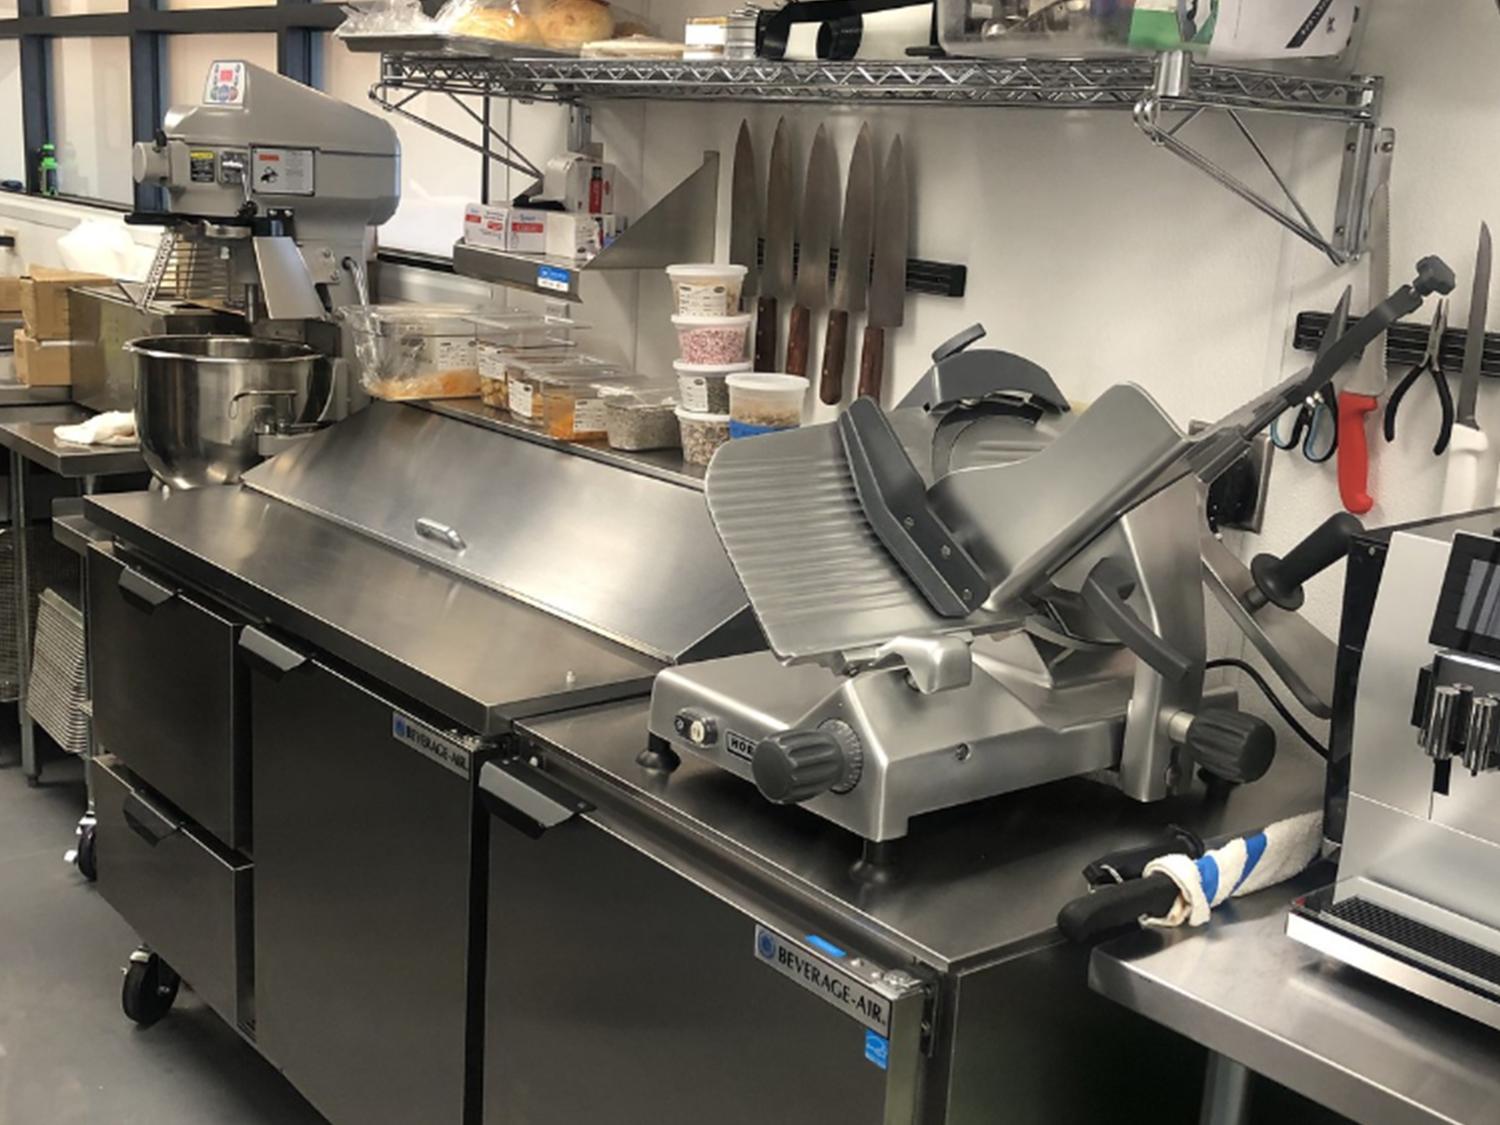 Slicer and undercounter refrigeration